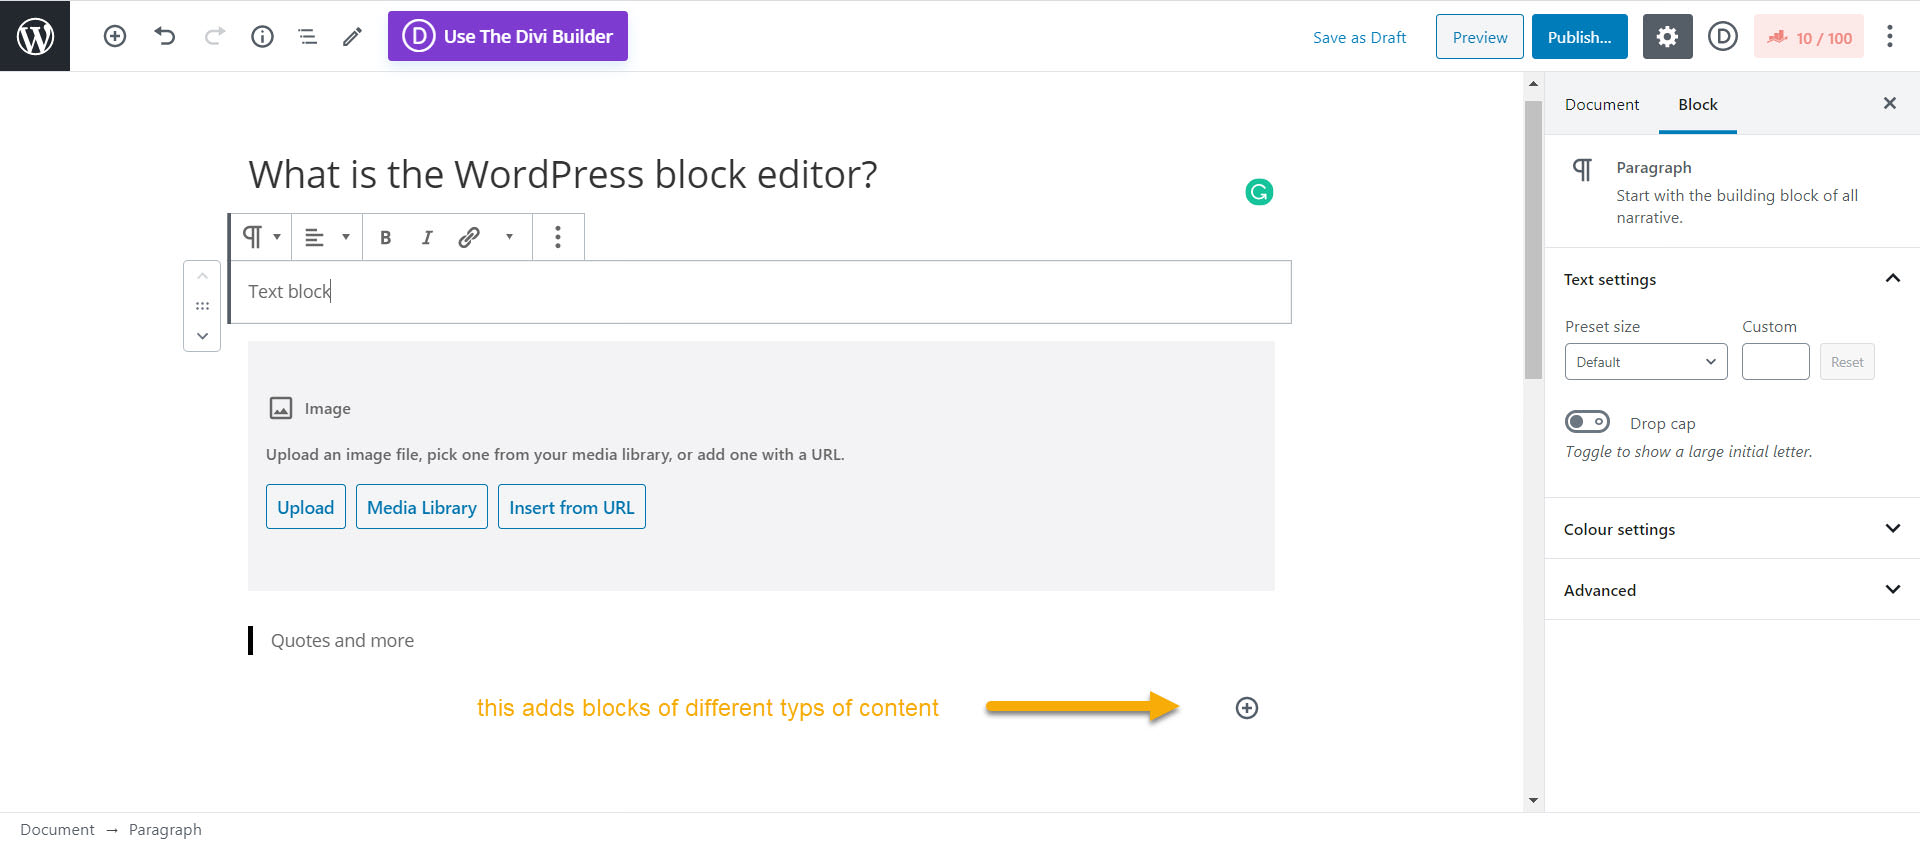 THD RankMathSEO WordPressBlockEditor